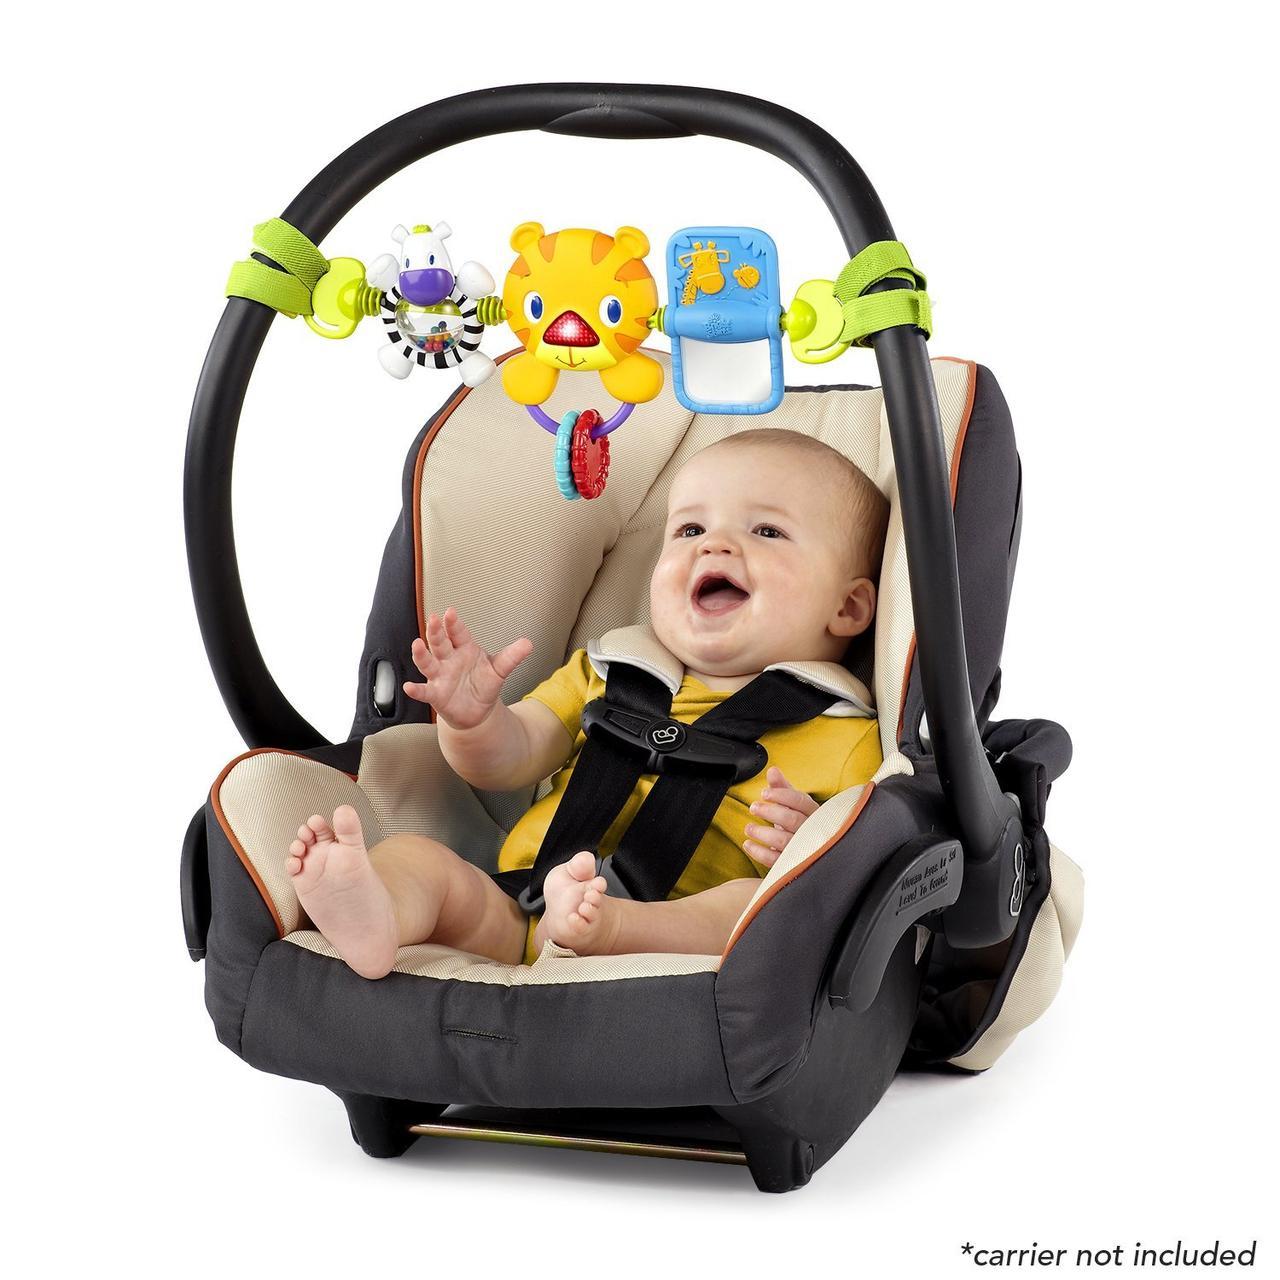 Bright Starts музыкальная подвесная игрушка Take Along Carrier Toy Bar